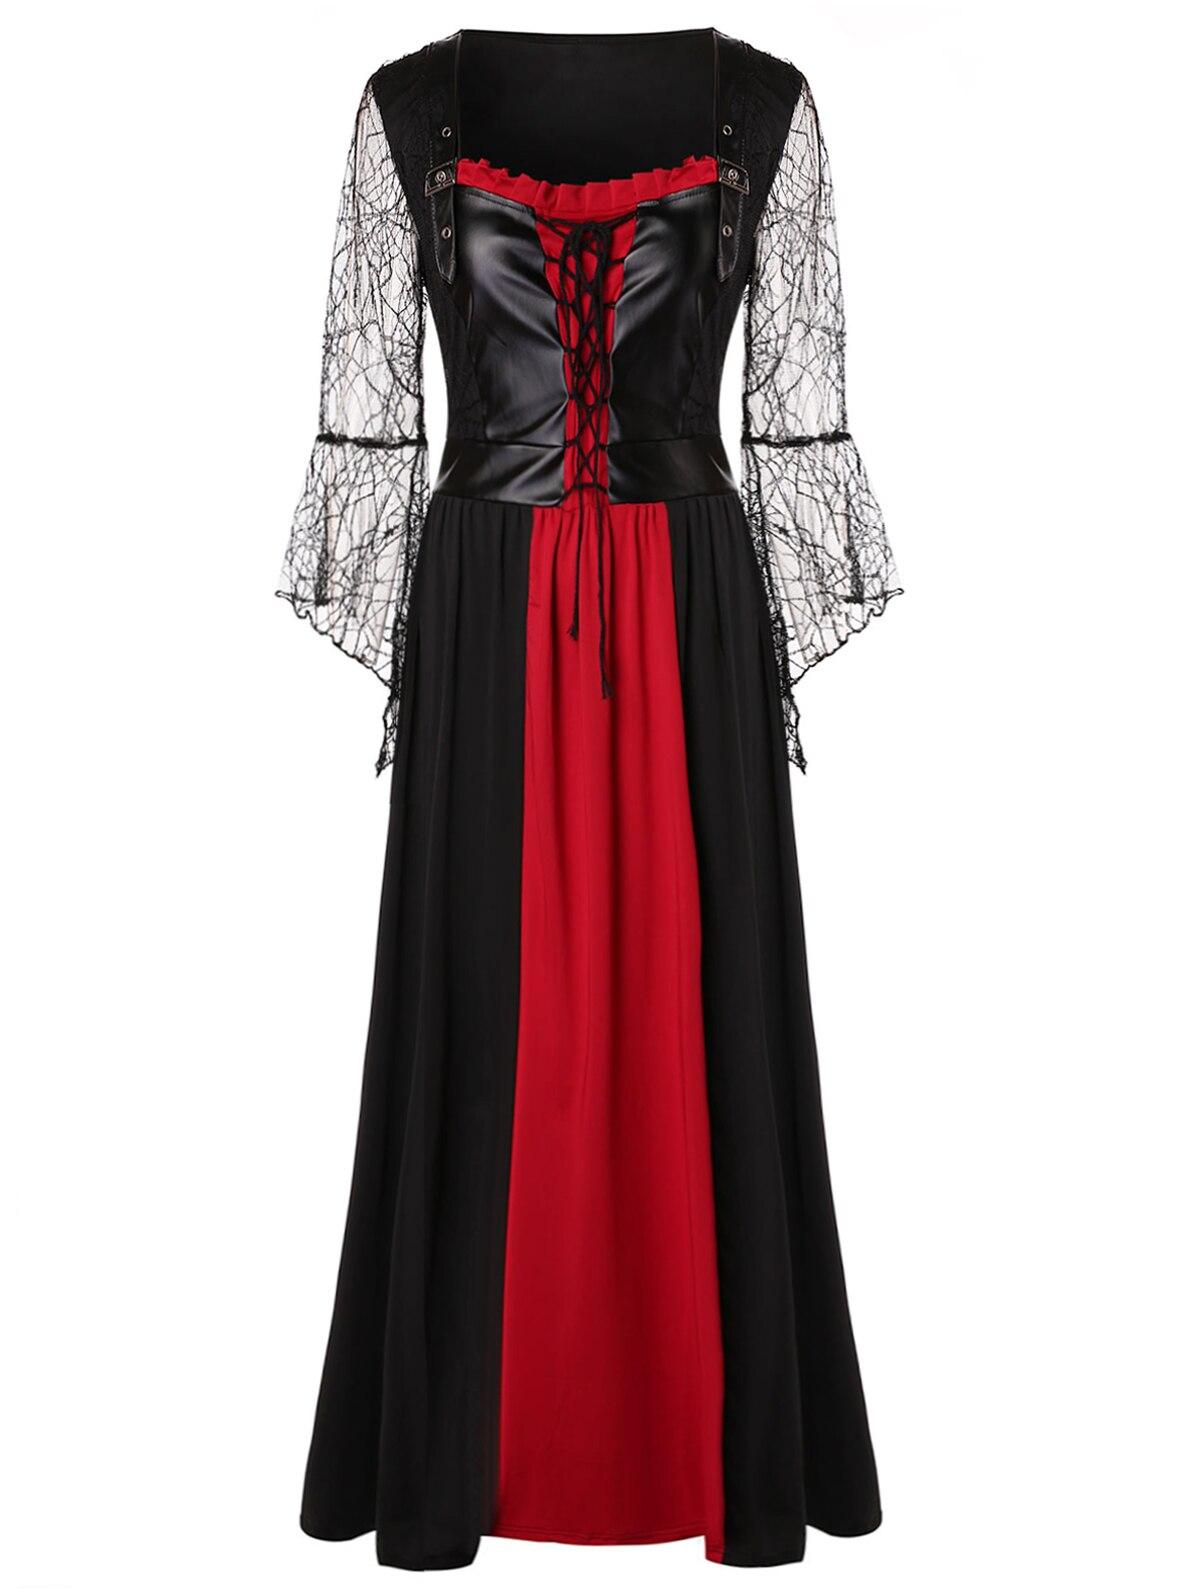 a0d5f379cc7 Wipalo European And American Large Size Elegant Lace Stitching V-Neck  Sleeveless Midi Gothic Dress Plus Size Women Dresses 2018